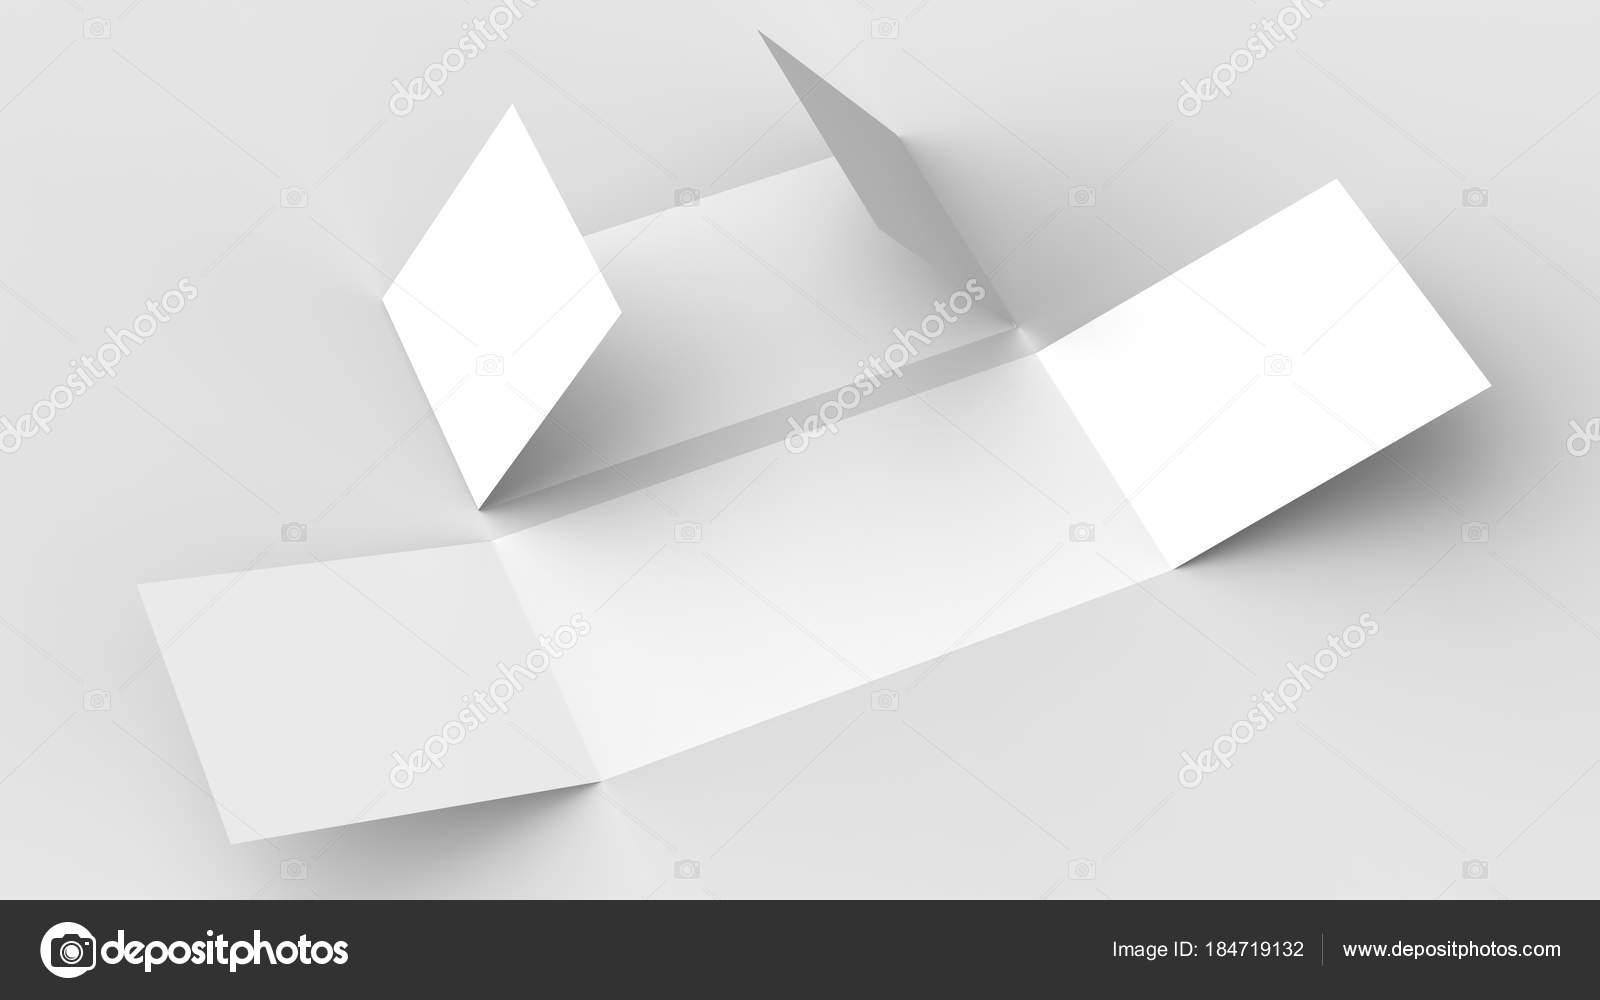 Single gate fold brochure mockup   Horizontal - landscape